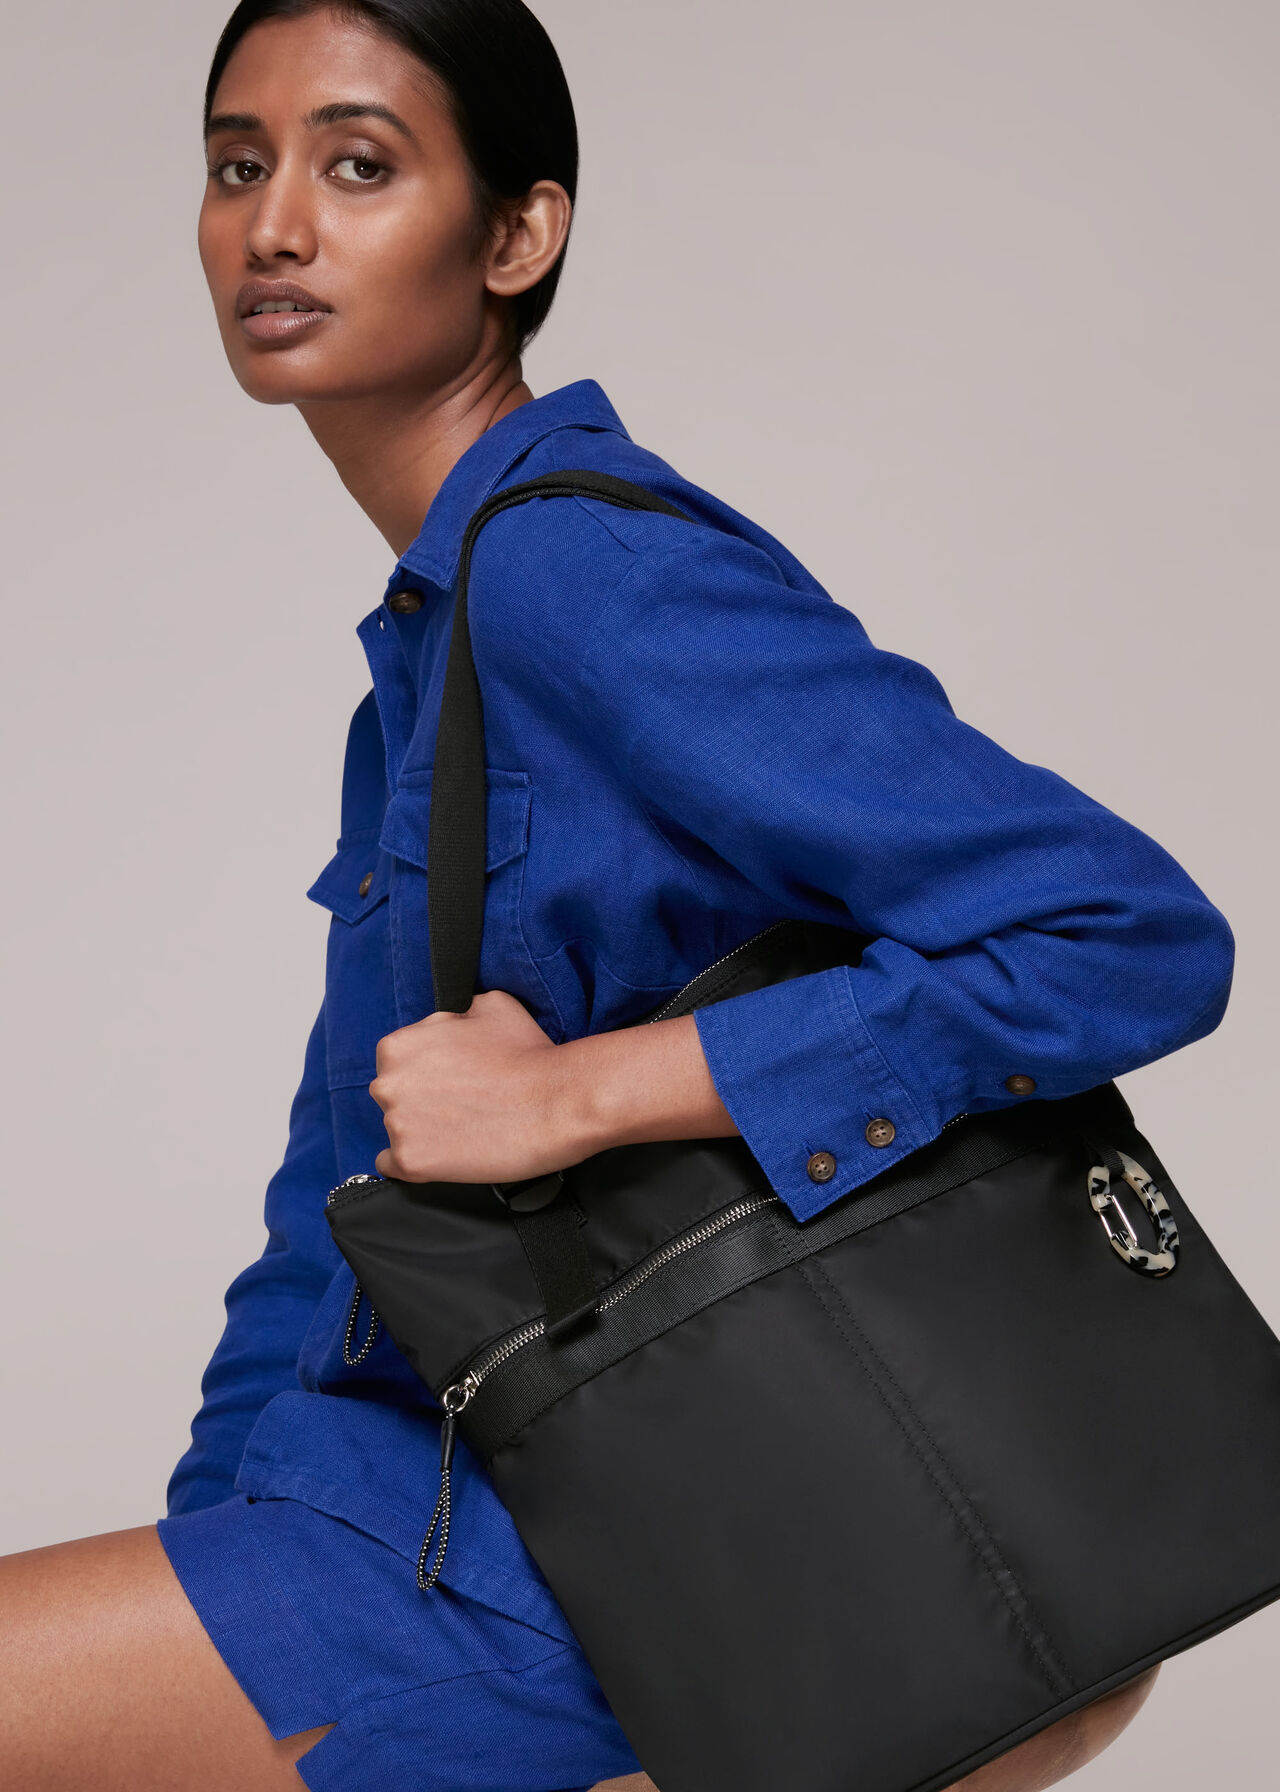 Rona Nylon Tote Bag